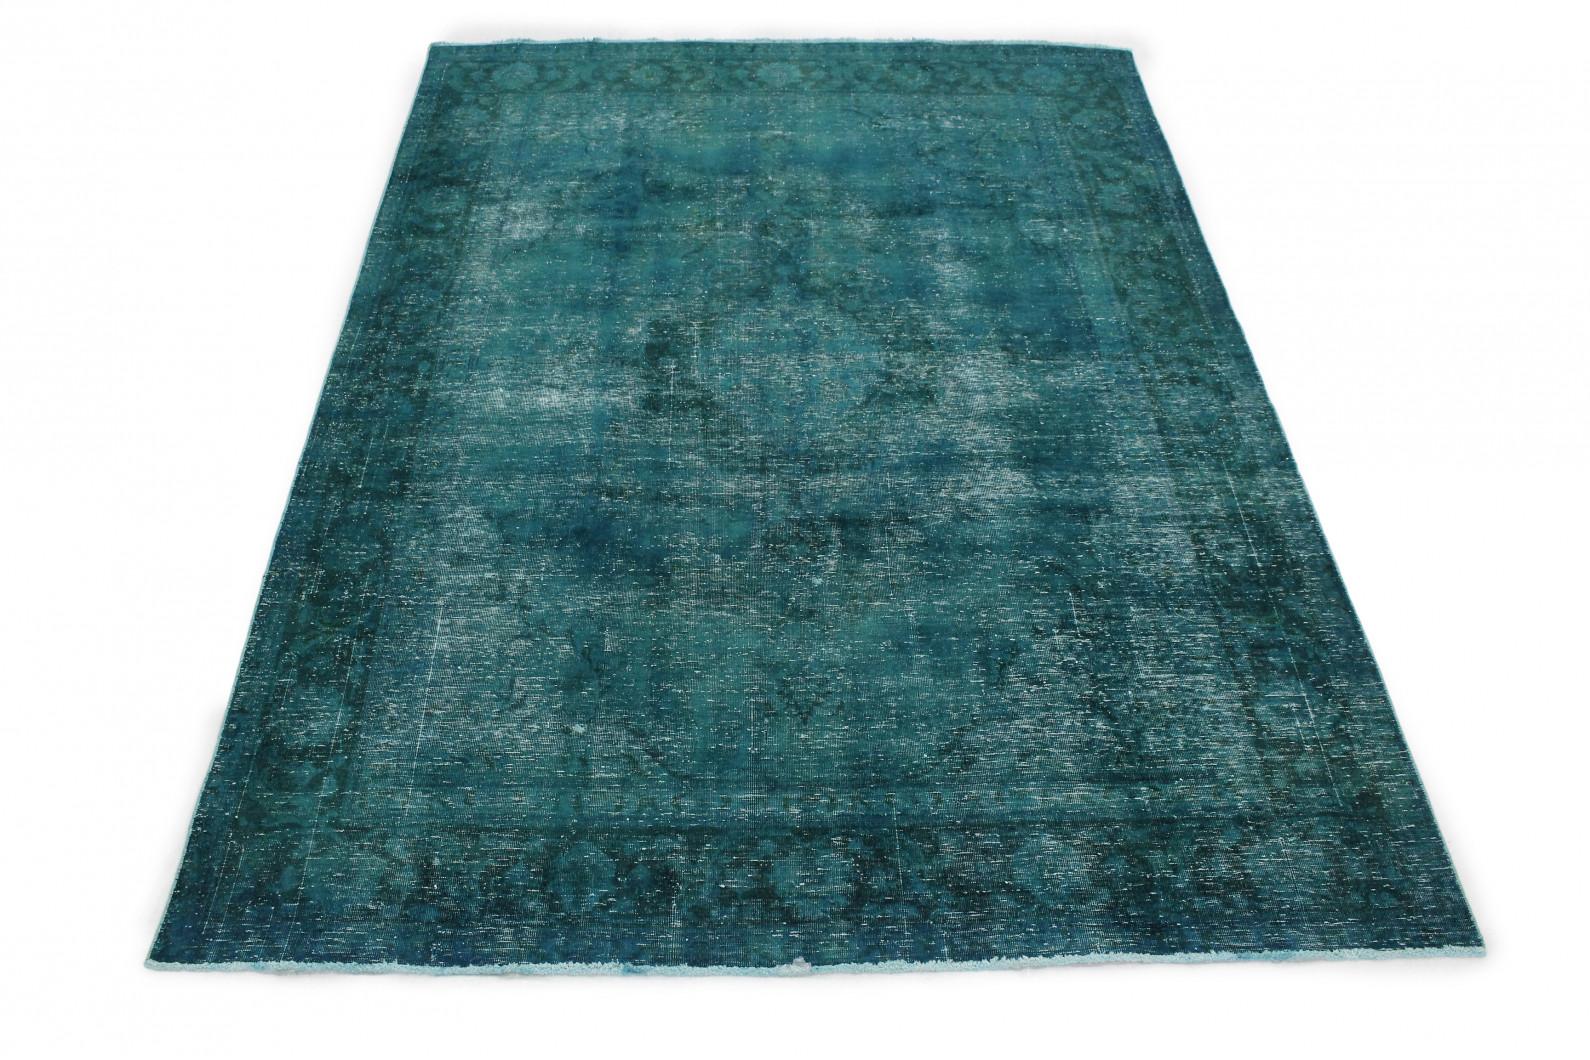 vintage teppich t rkis in 340x240 1001 177261 bei. Black Bedroom Furniture Sets. Home Design Ideas